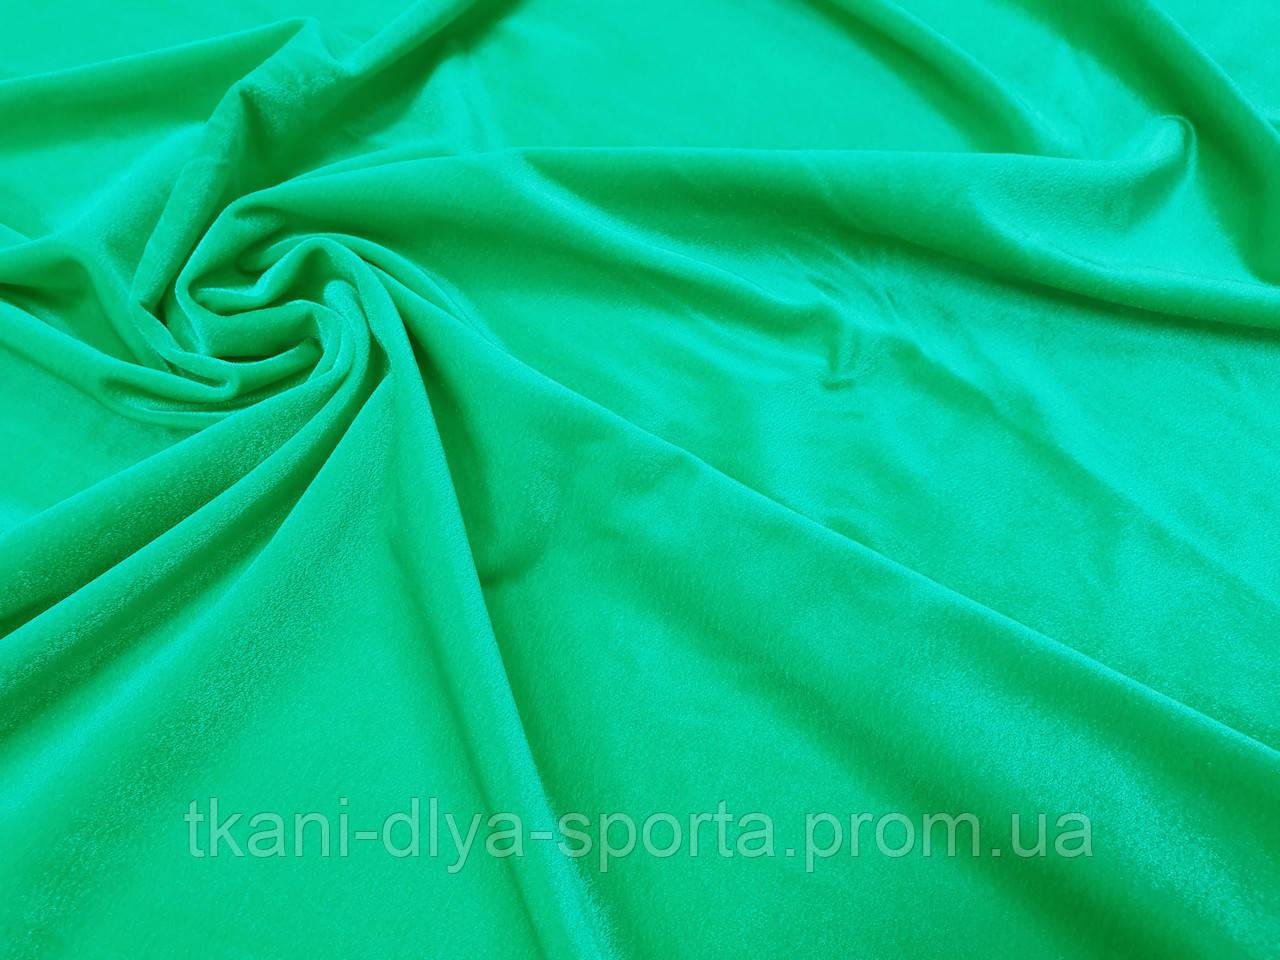 Стрейч-бархат гладкий CHRISANNE (Англия) зеленый (emerald)